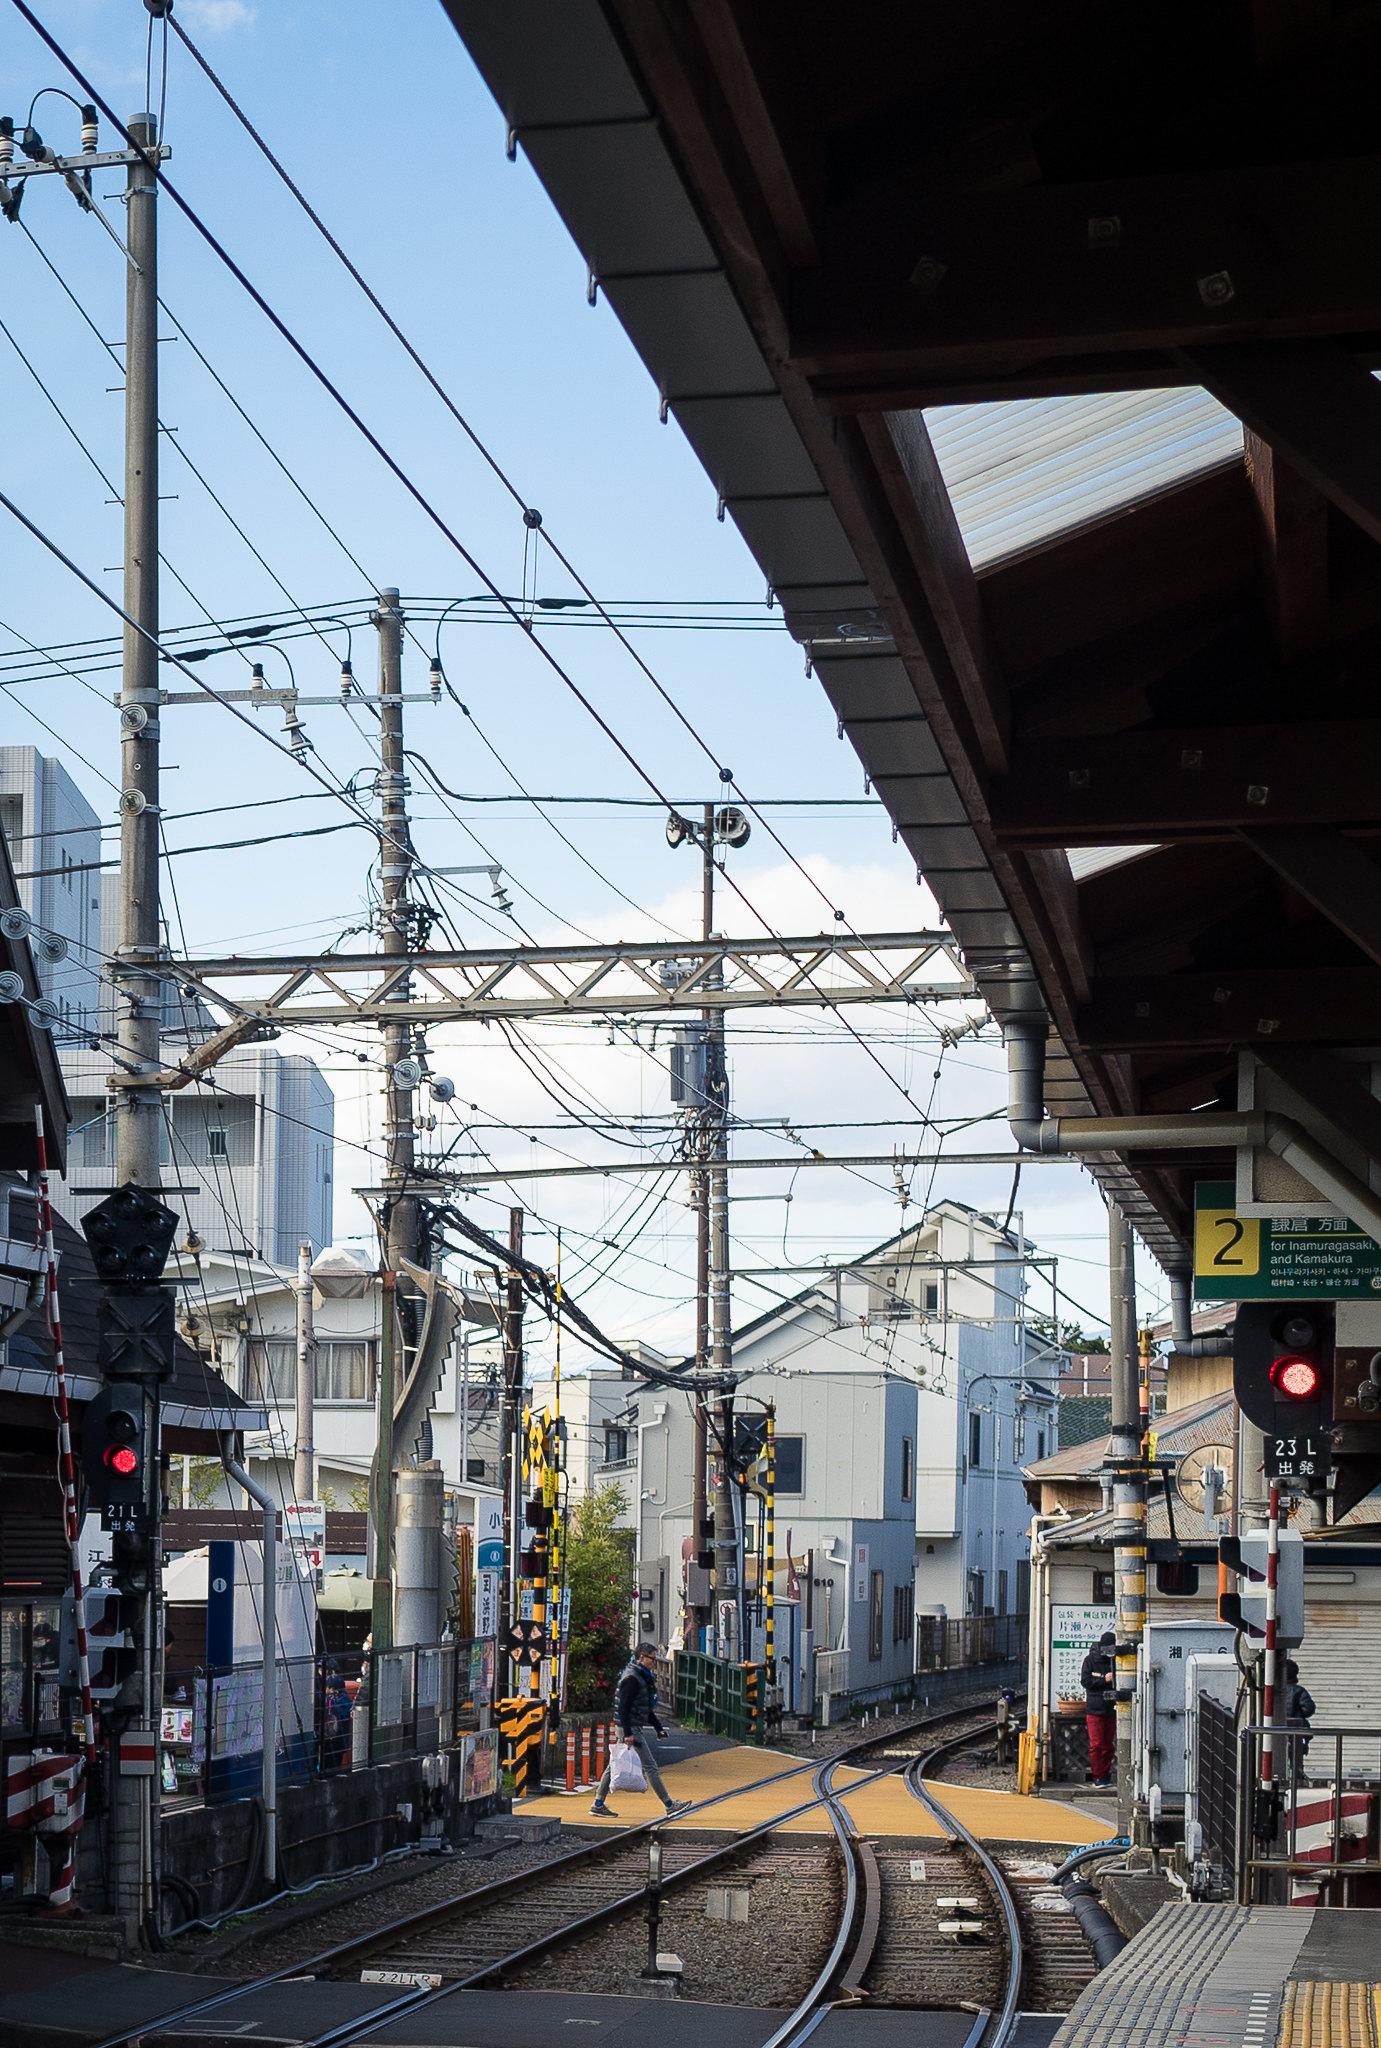 Winter Stroll in Enoshima